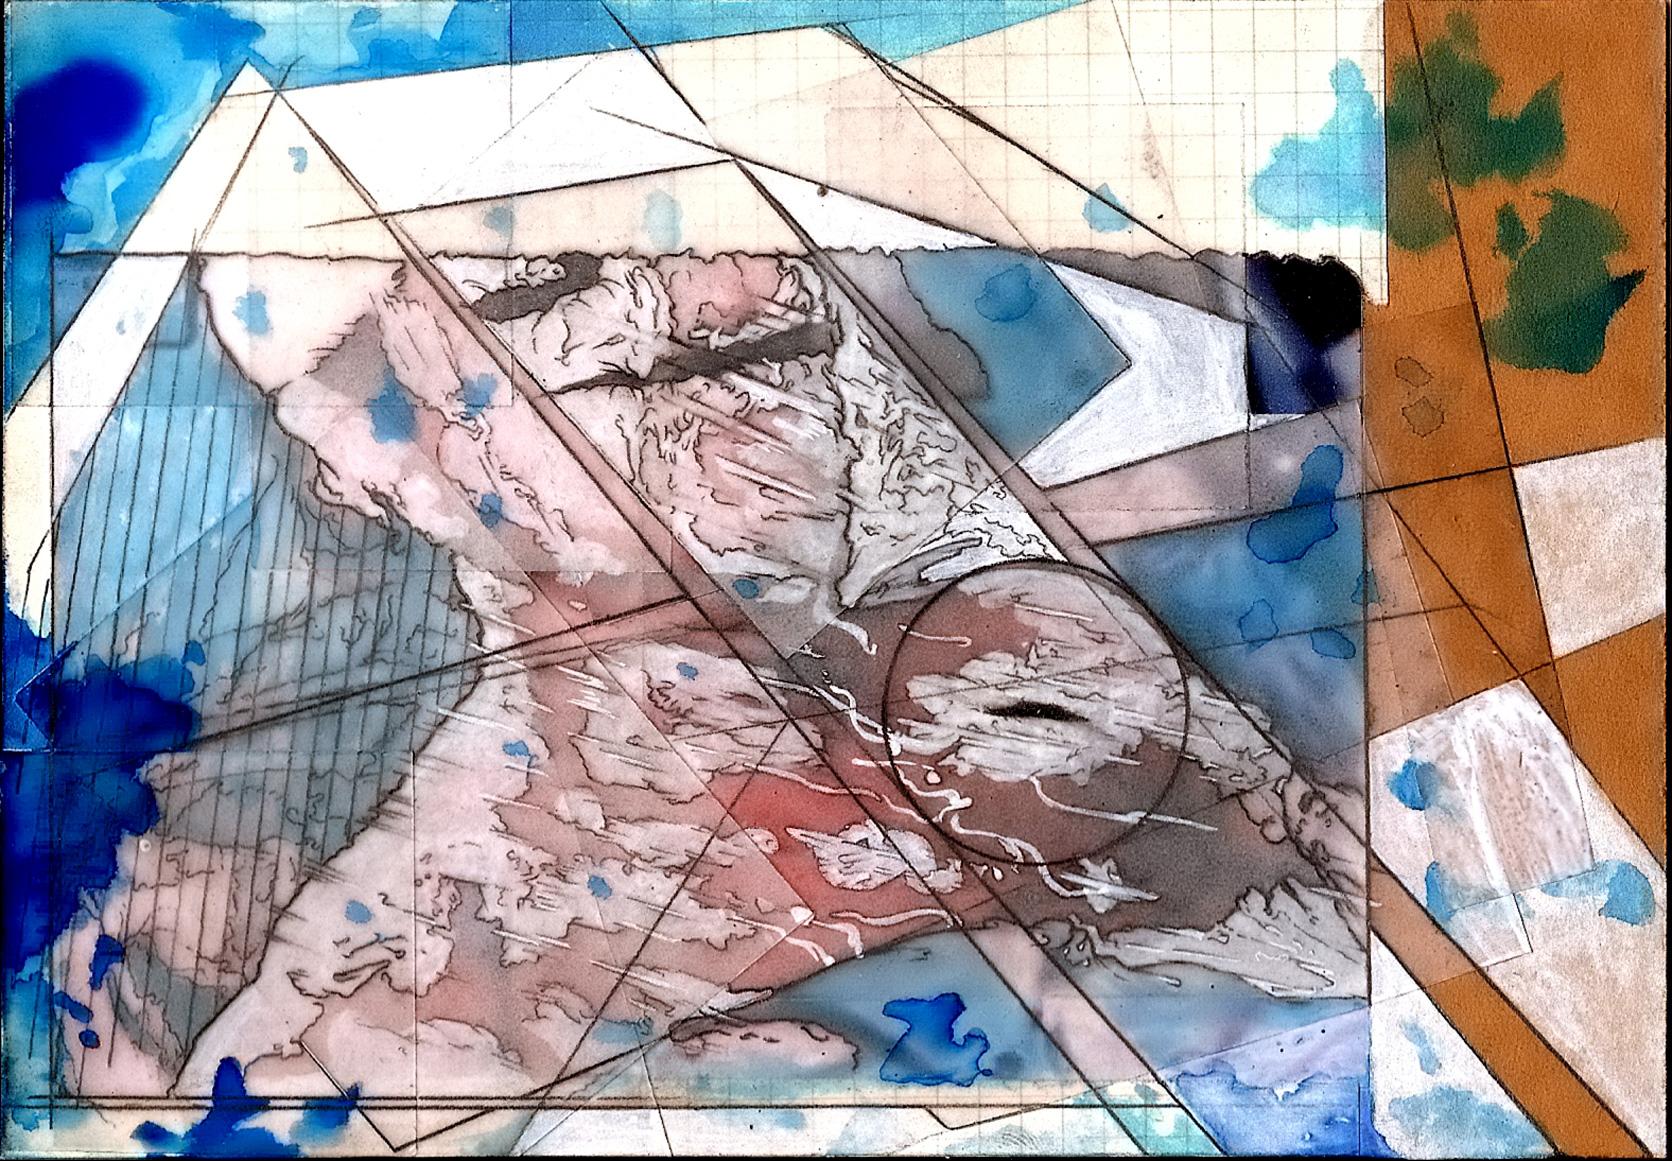 00000→Monckton / Excavation / Potential Wound Profile – Angle 1 / Version 4